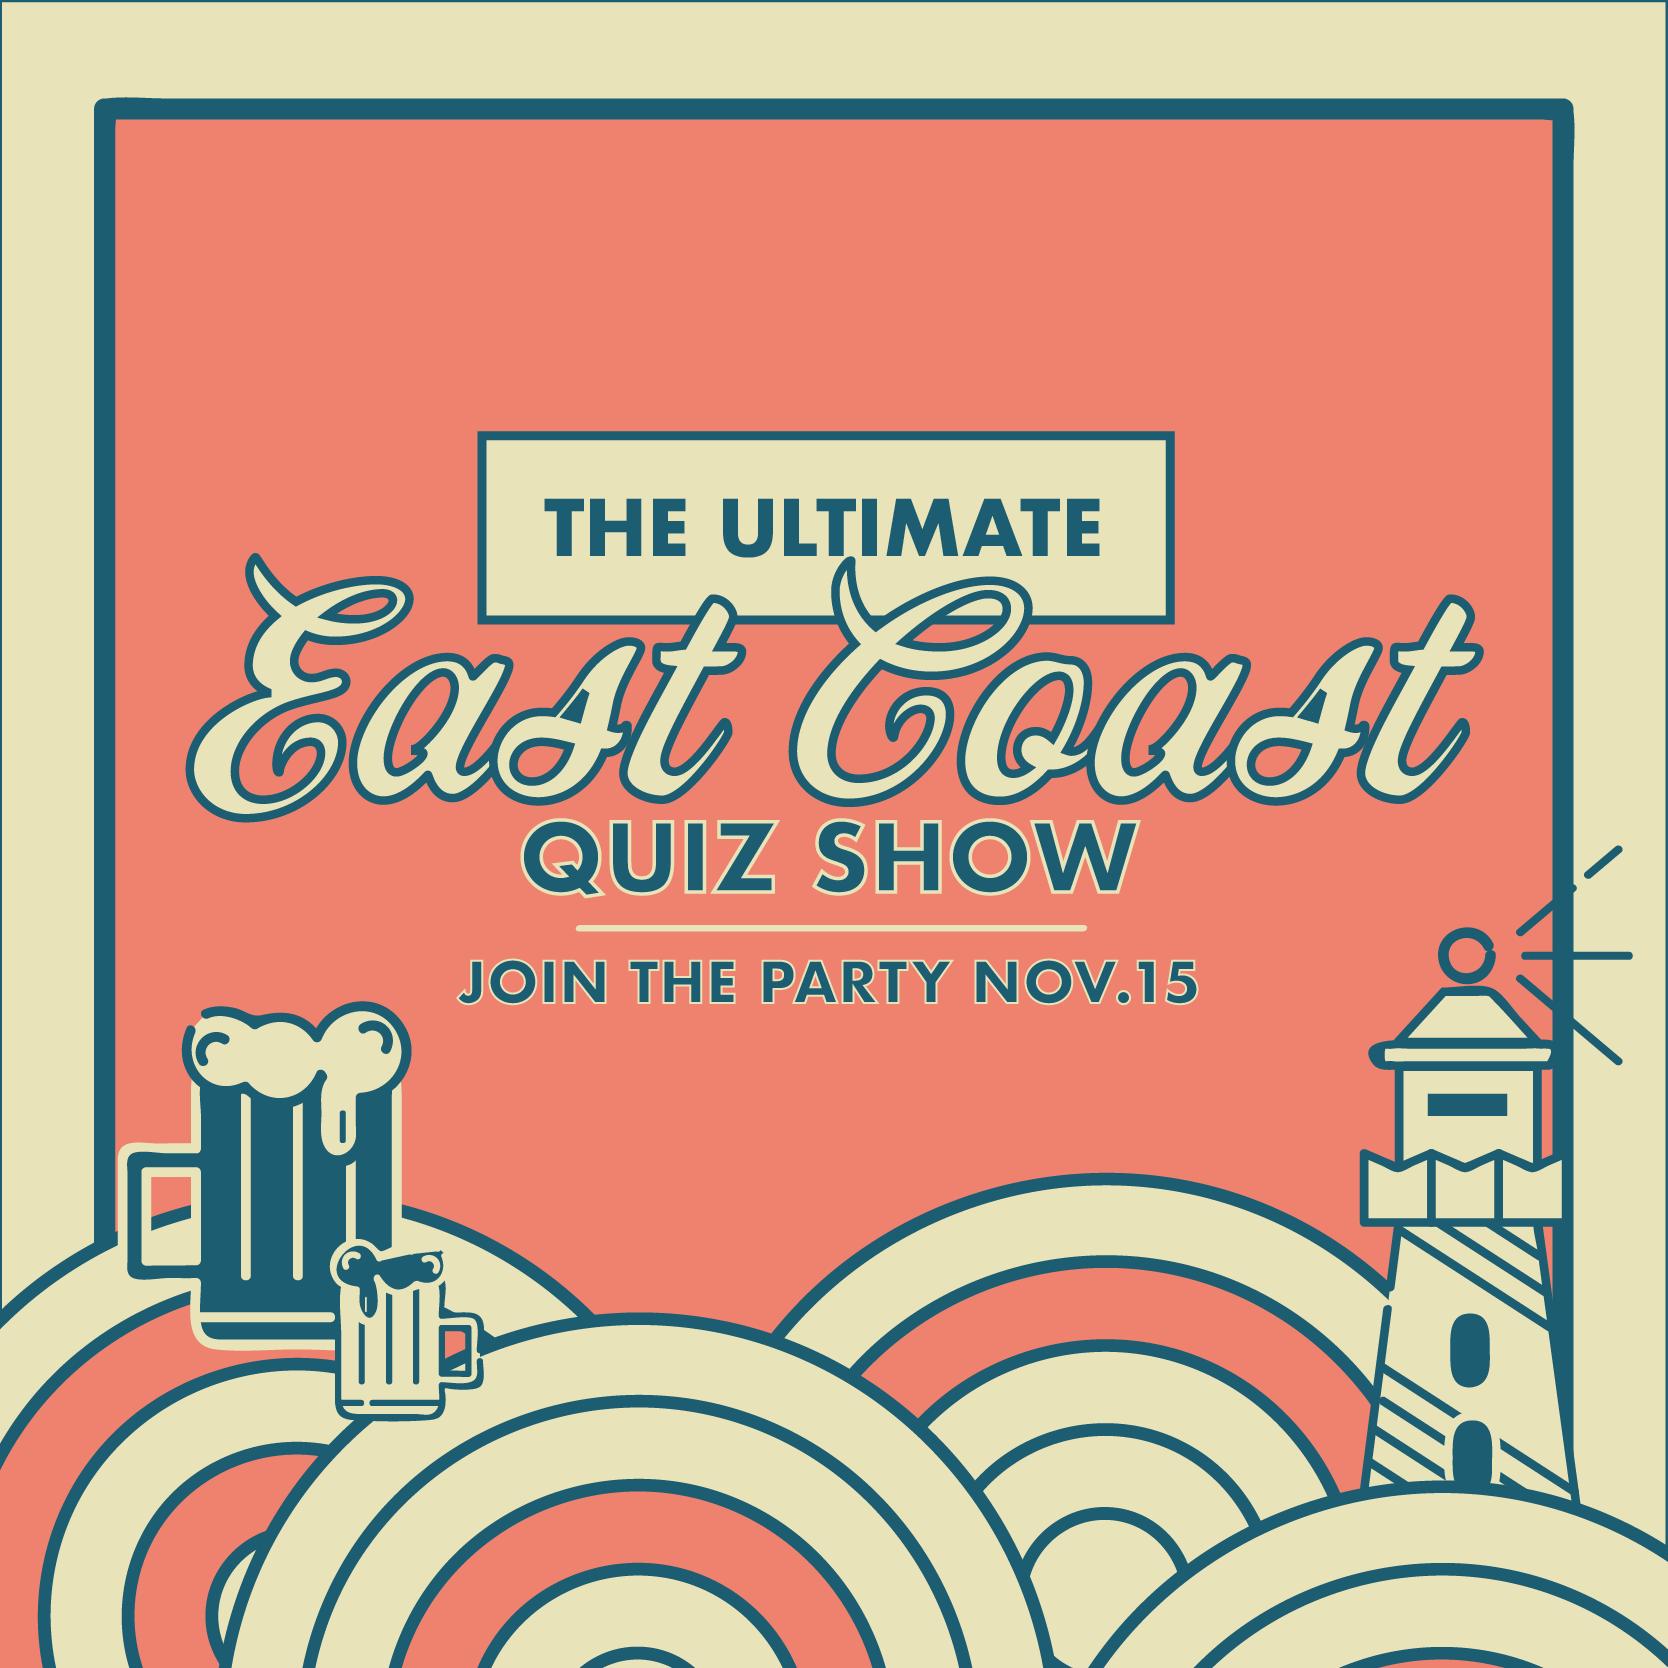 The Ultimate East Coast Quiz Show – Nov. 15, 2019